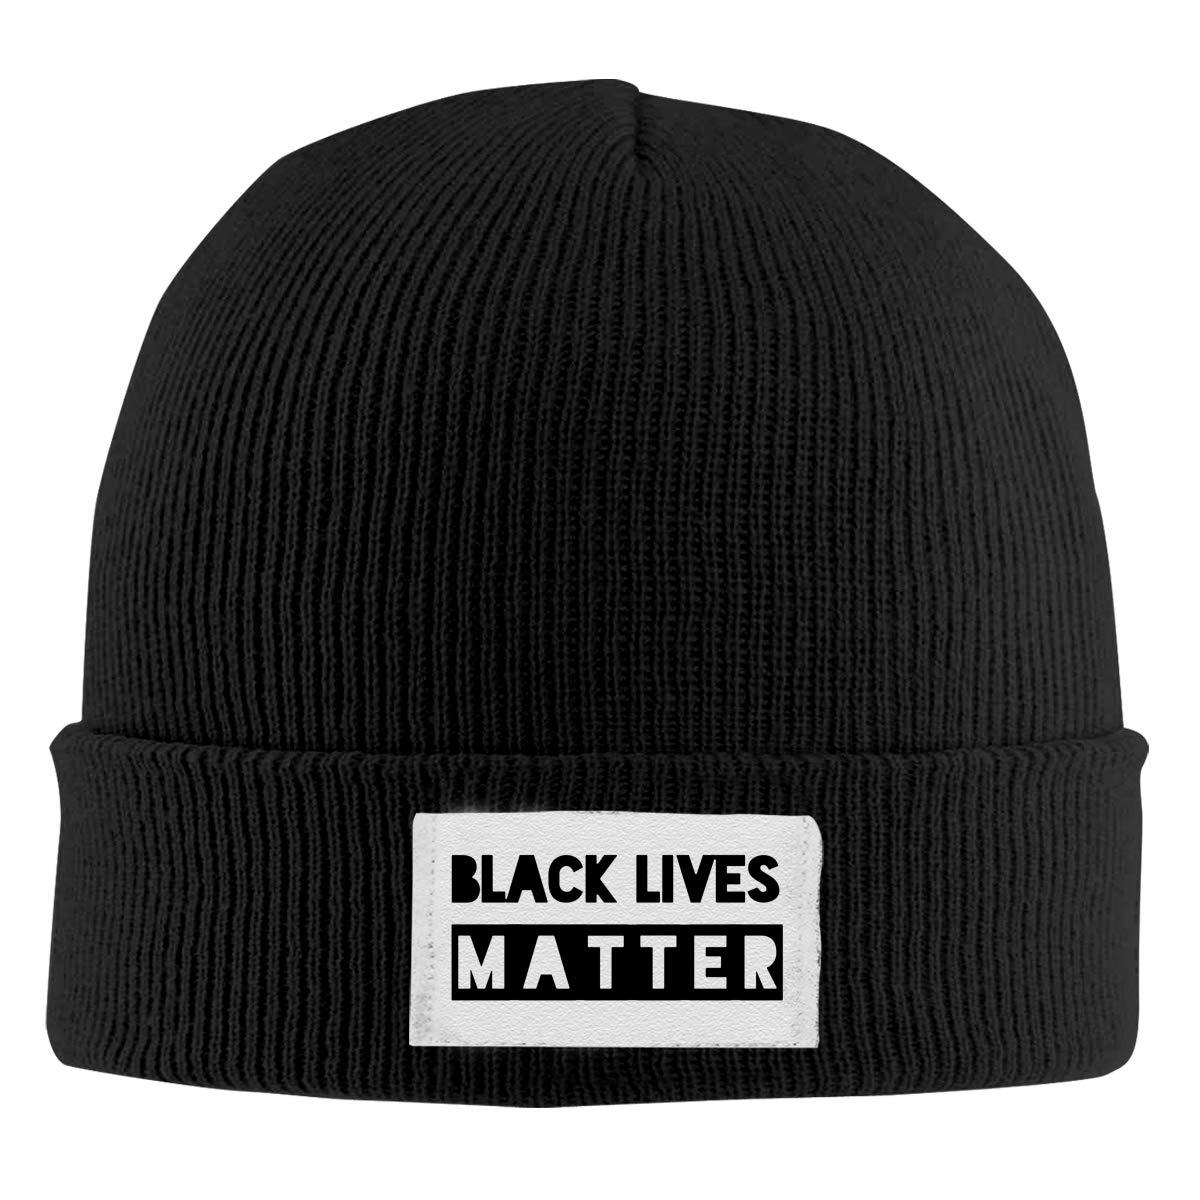 Stretchy Cuff Beanie Hat Black Dunpaiaa Skull Caps Black Lives Matter 1 Winter Warm Knit Hats